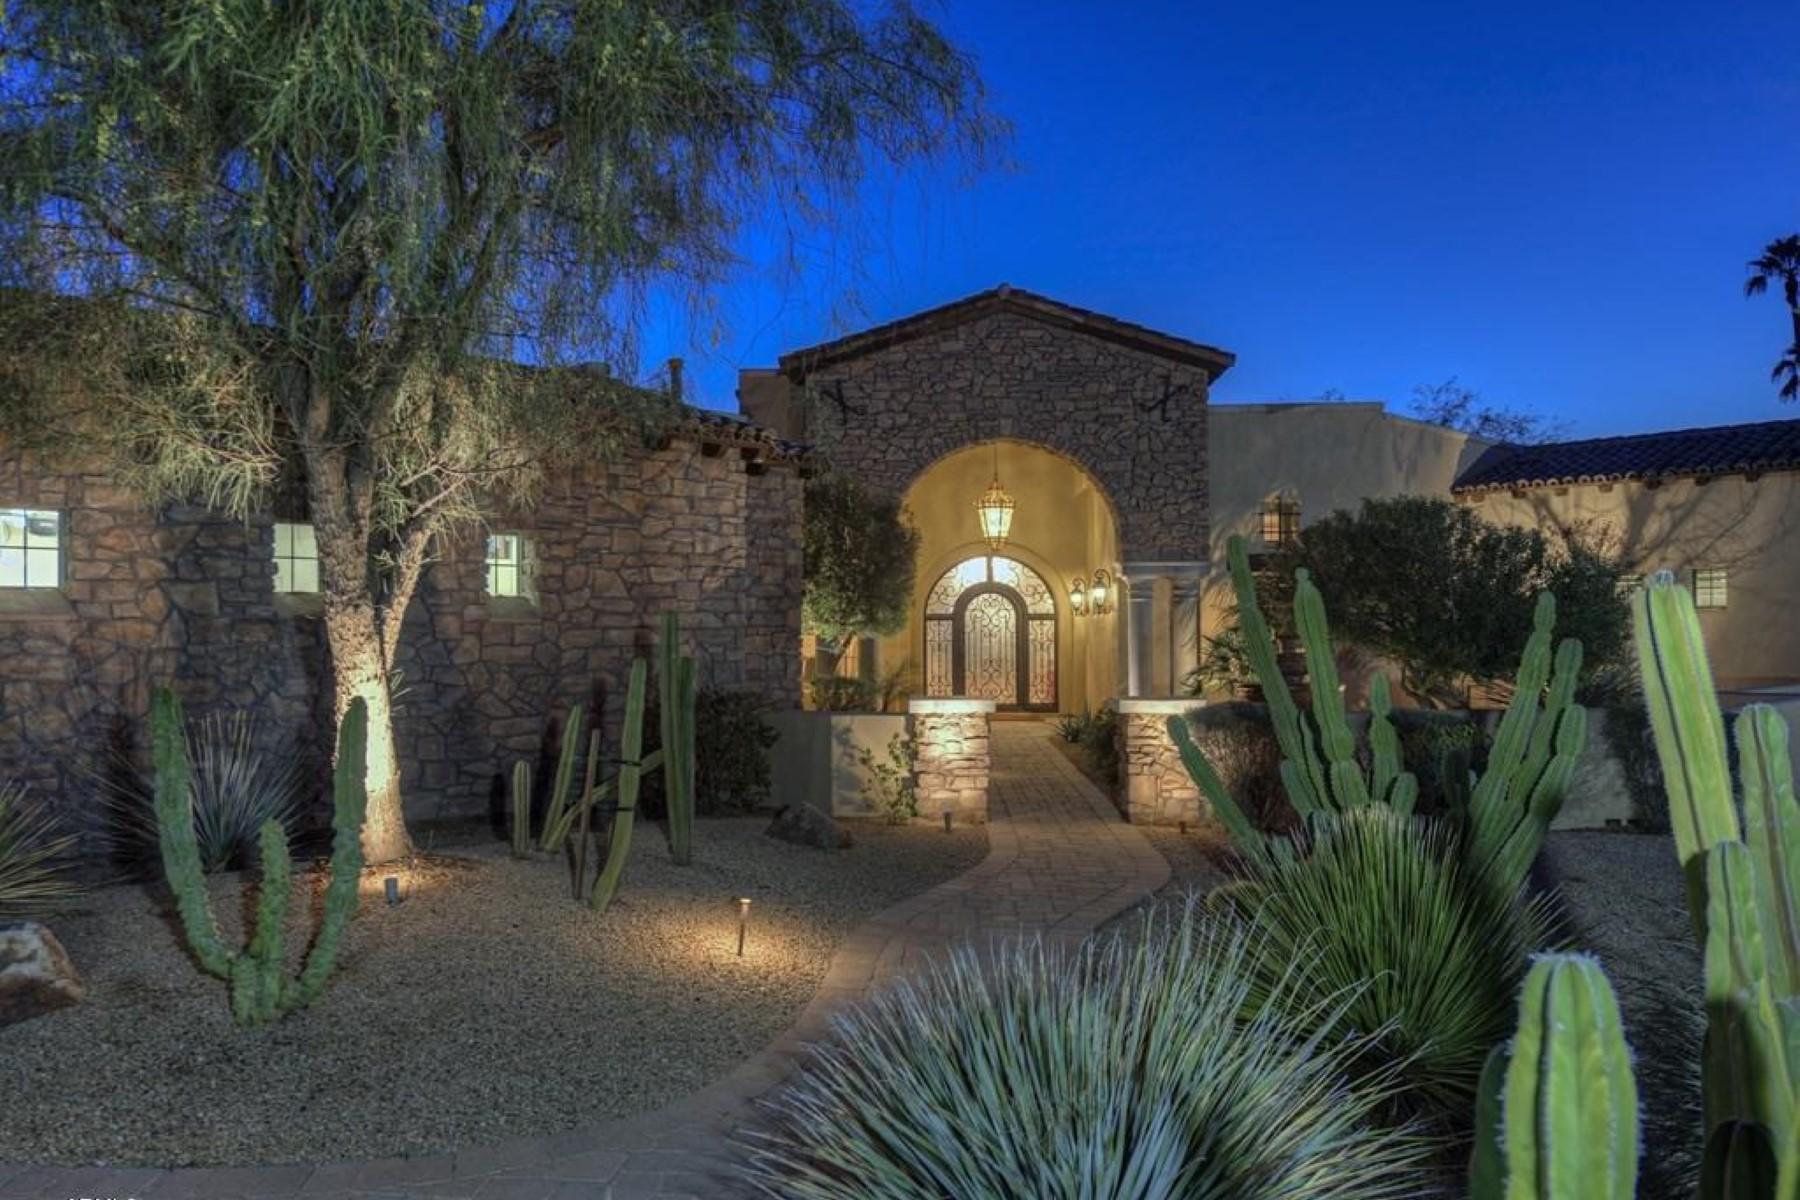 Vivienda unifamiliar por un Venta en Impressive custom built home on a private cul de sac lot 7429 E Edward Ln Scottsdale, Arizona 85250 Estados Unidos